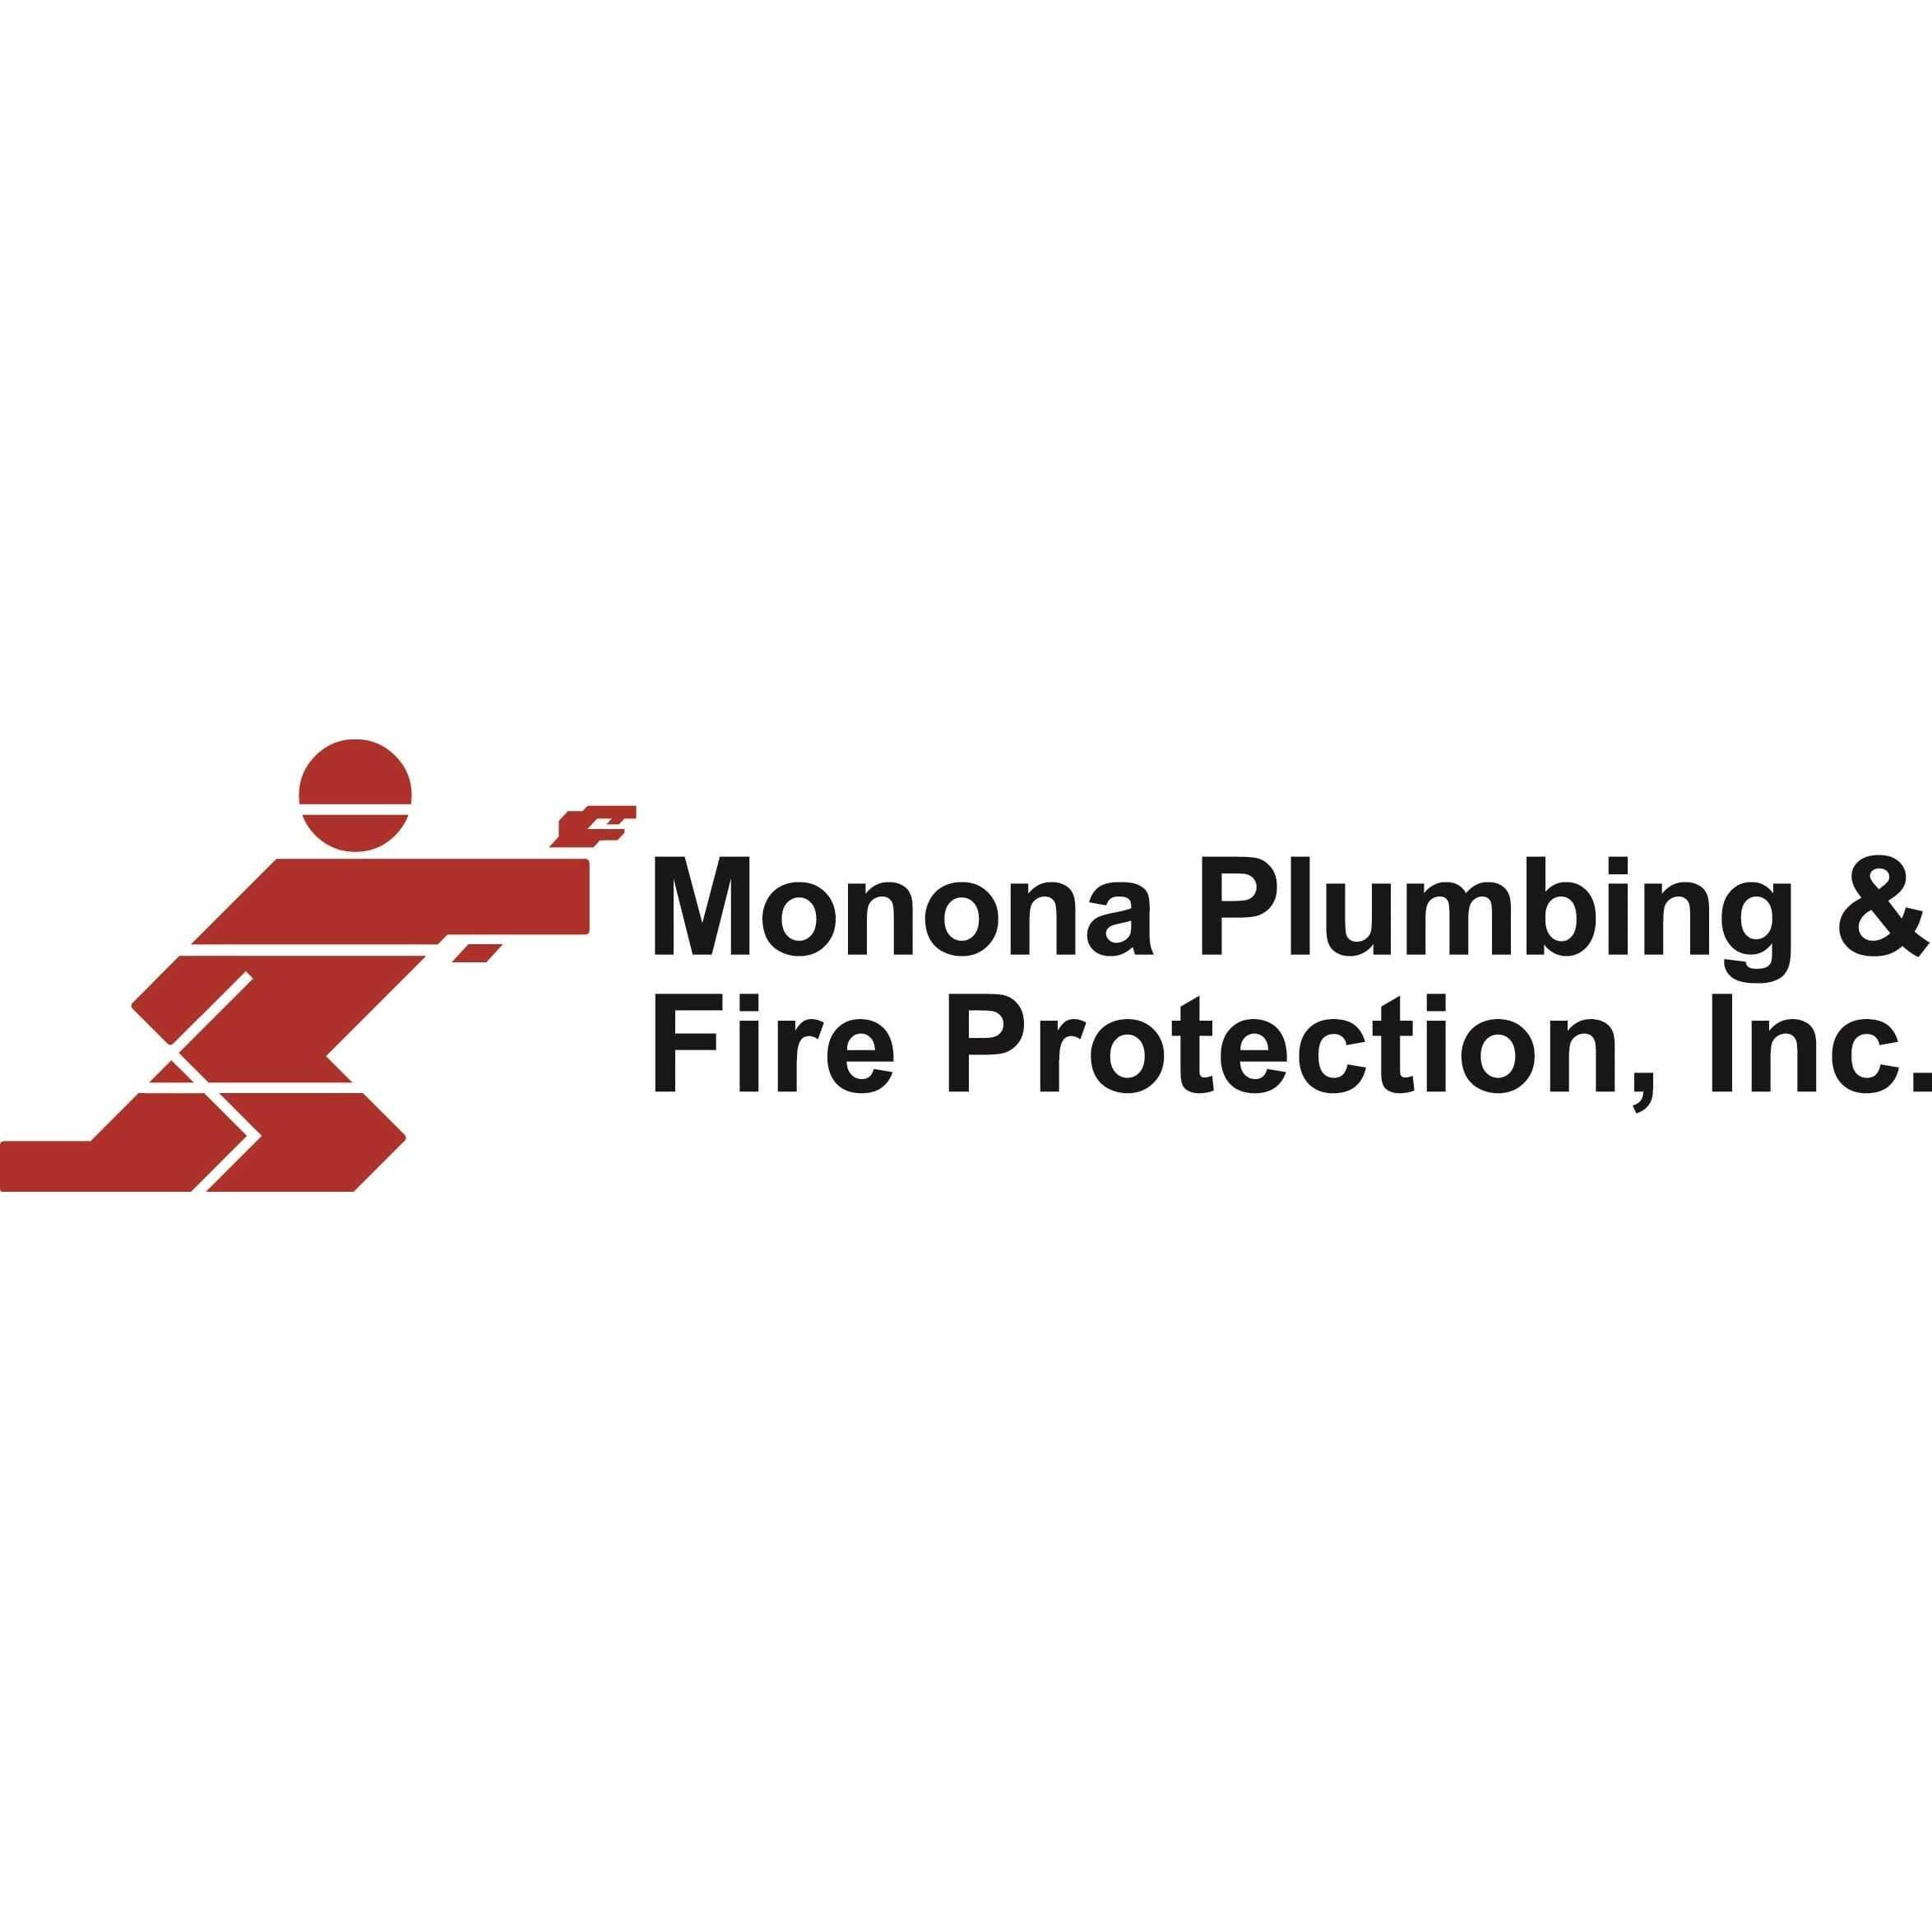 Monona Plumbing & Fire Protection Inc - Madison, WI 53713 - (608)273-4556 | ShowMeLocal.com